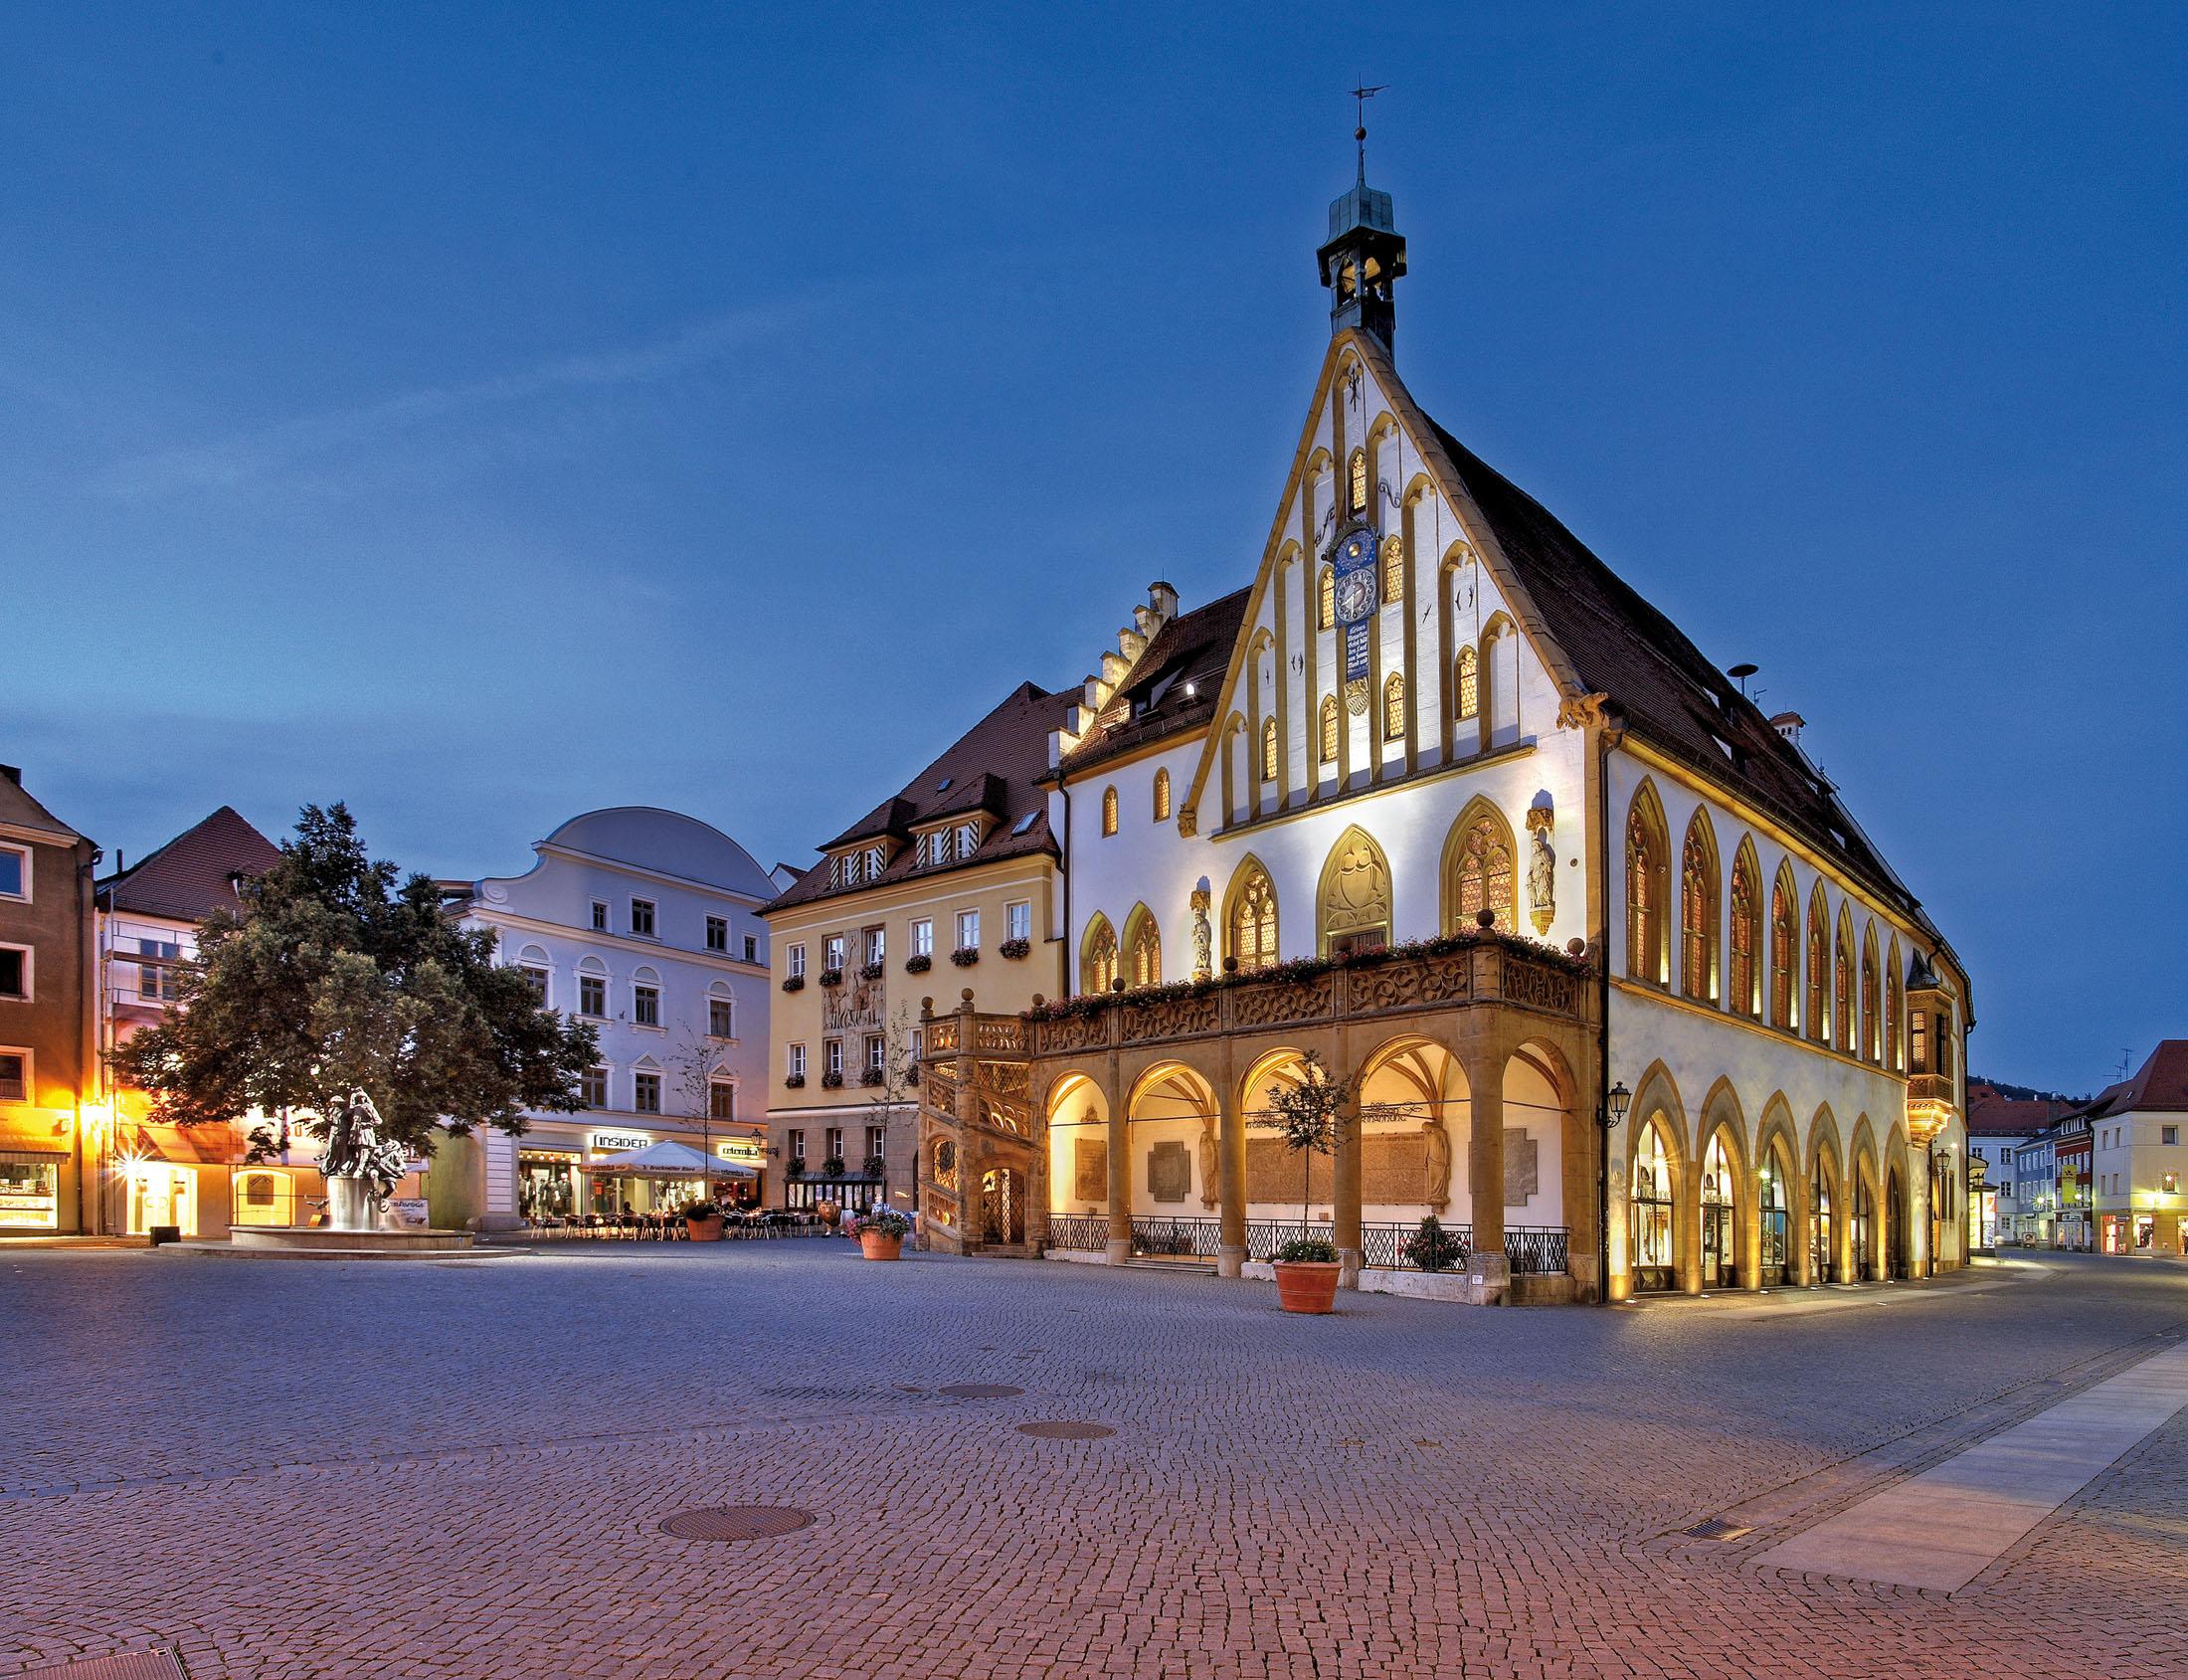 The gothic town hall in Amberg - Das gothische Rathaus in Amberg